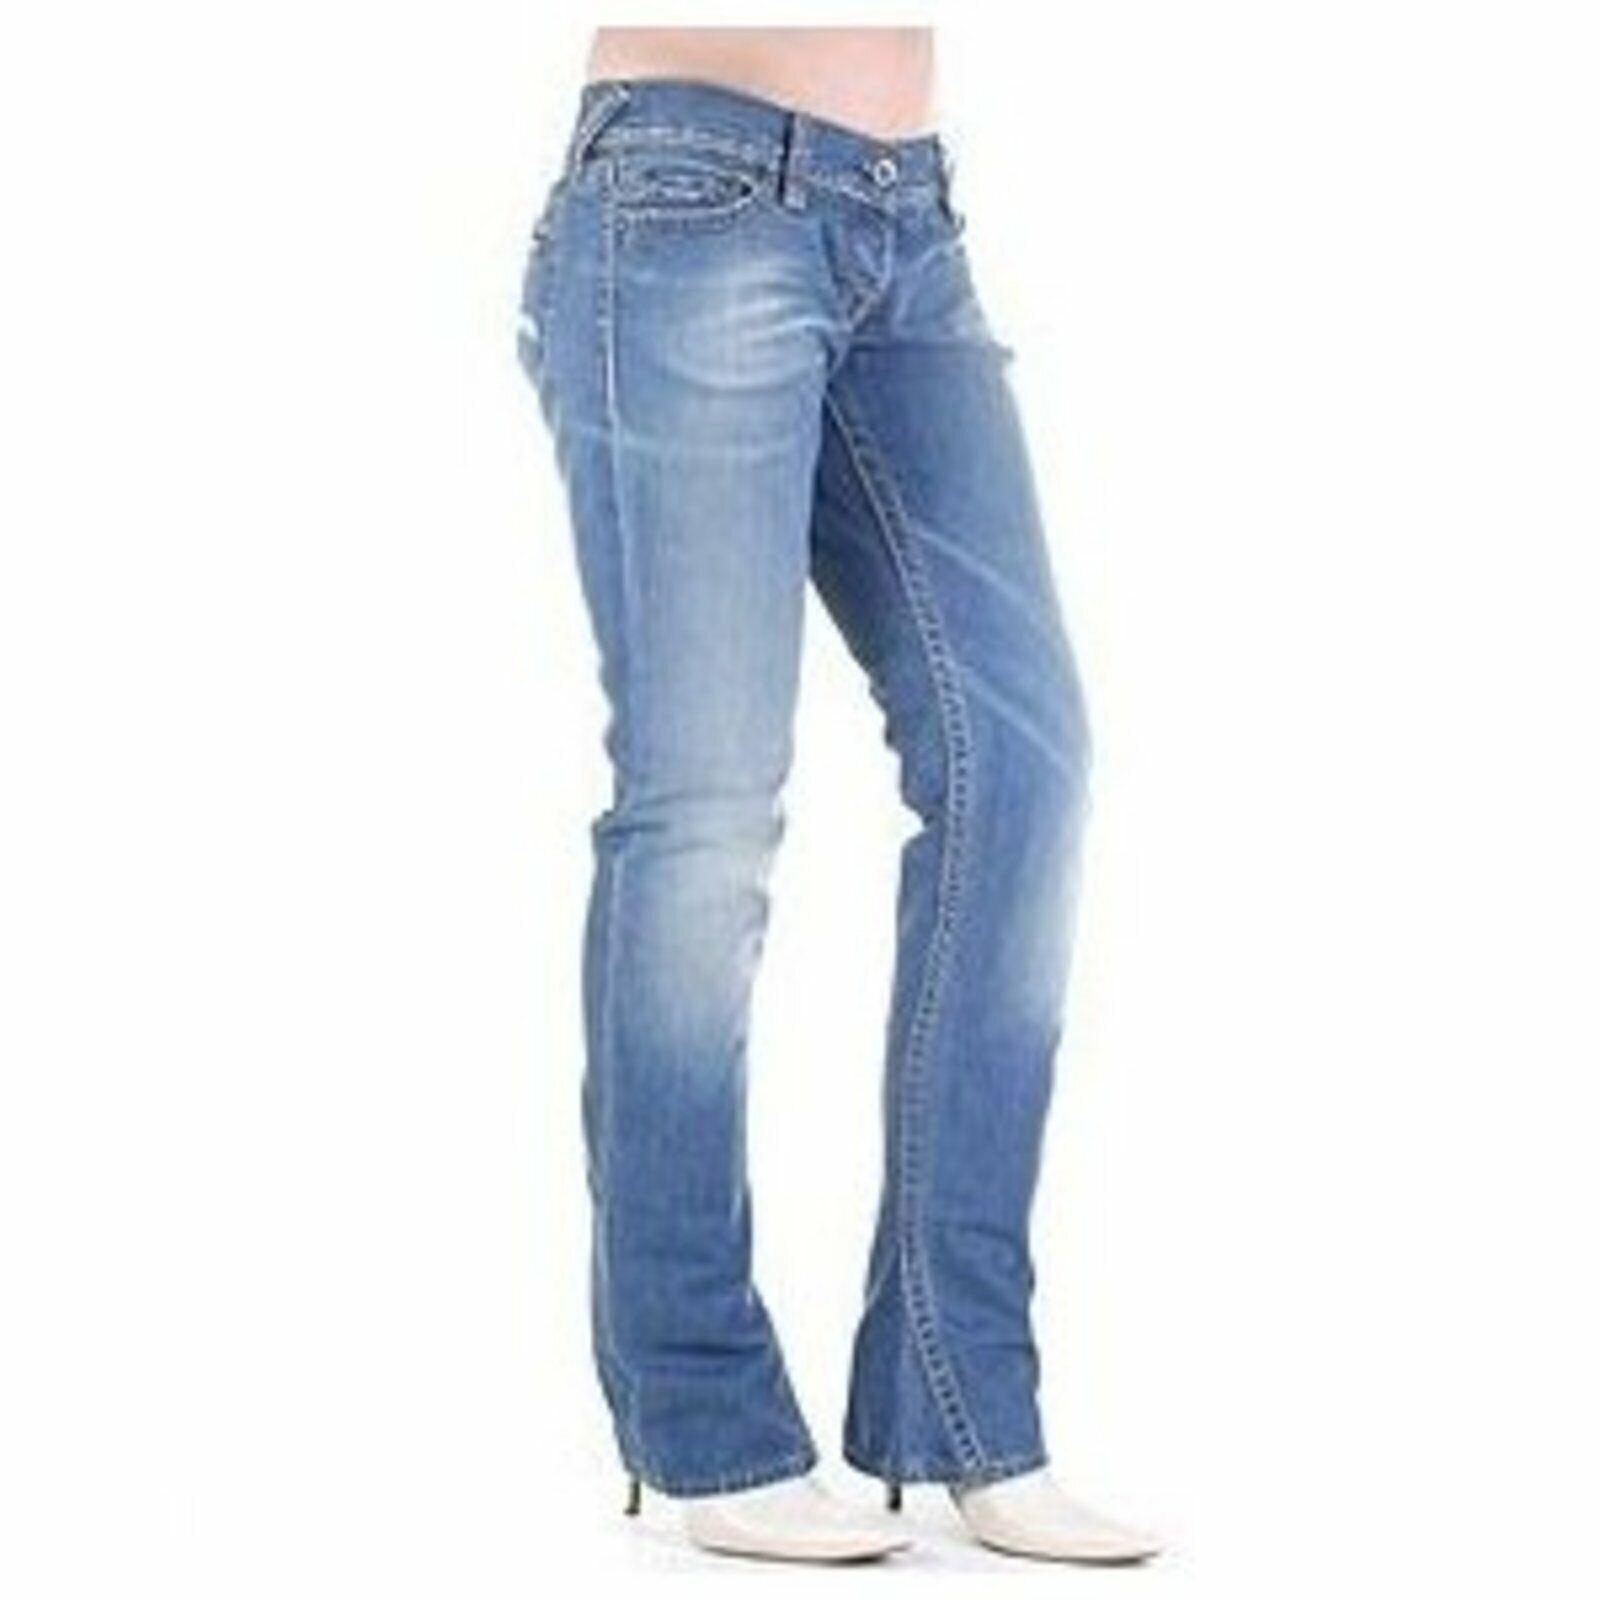 Evisu démarragecut Jeans Rivets Pantalon Bleu femmes Faible Waist Denim 100% Cotton bleu 28 S